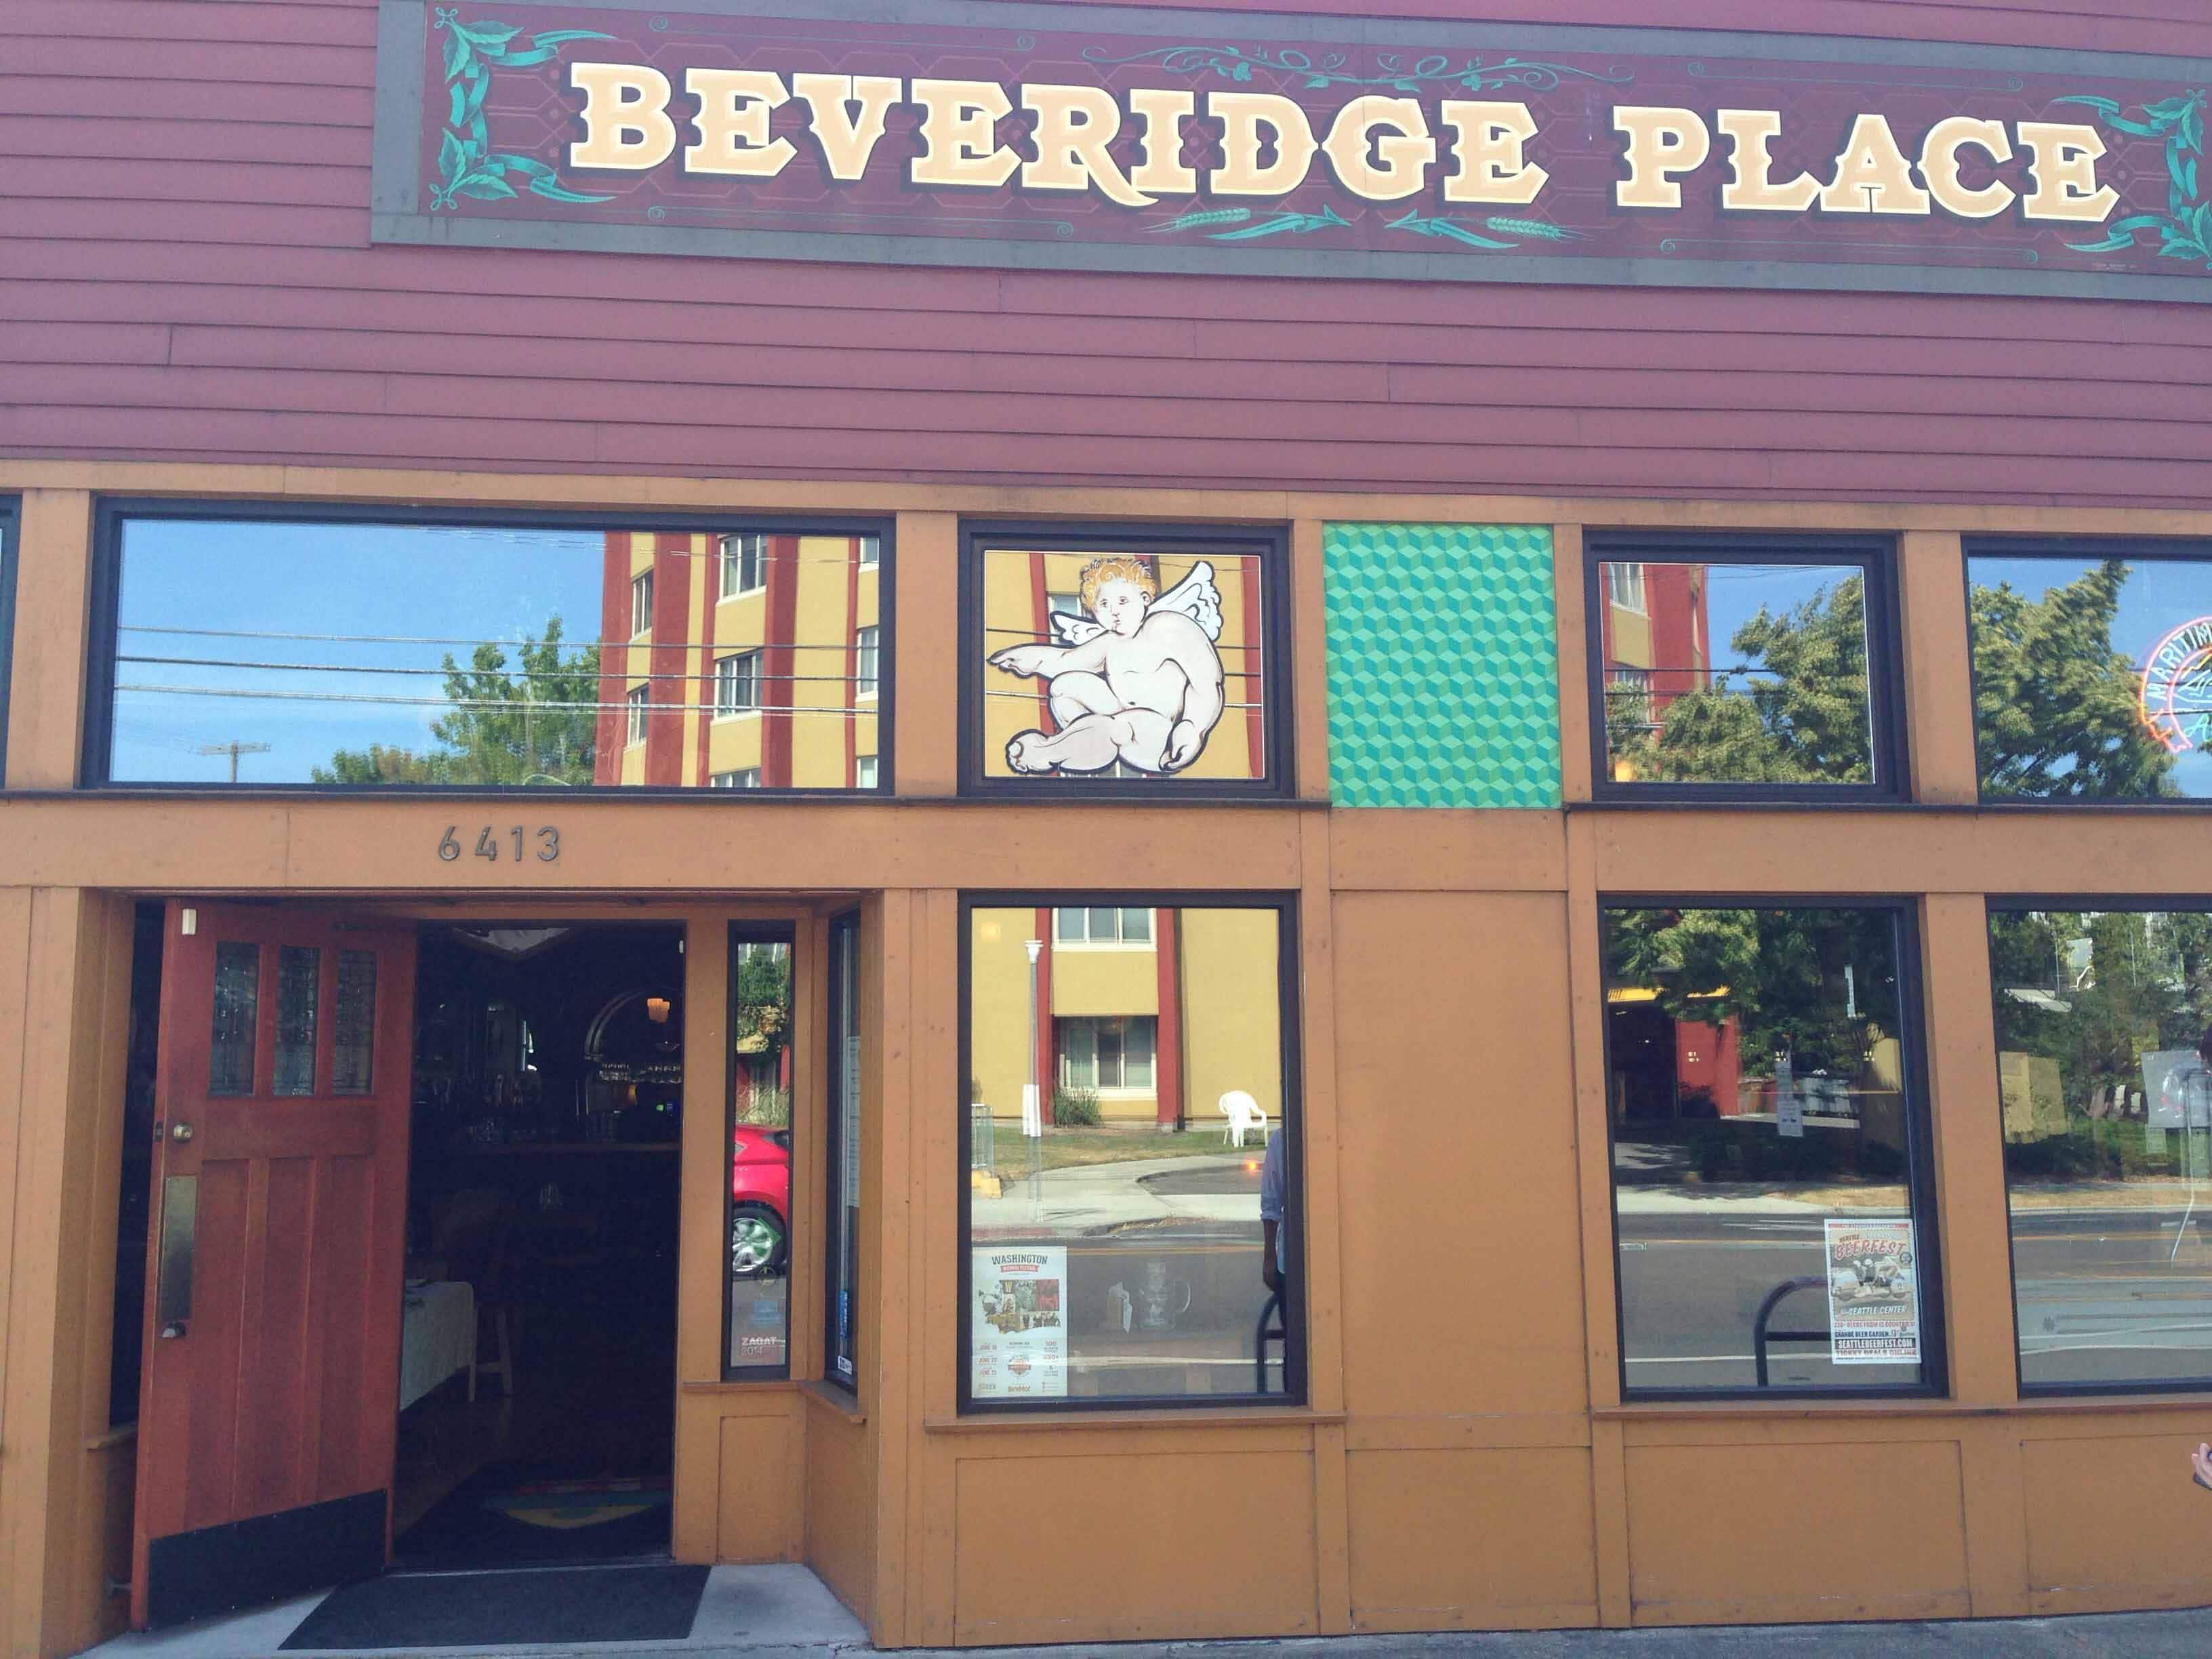 Beveridge place seattle